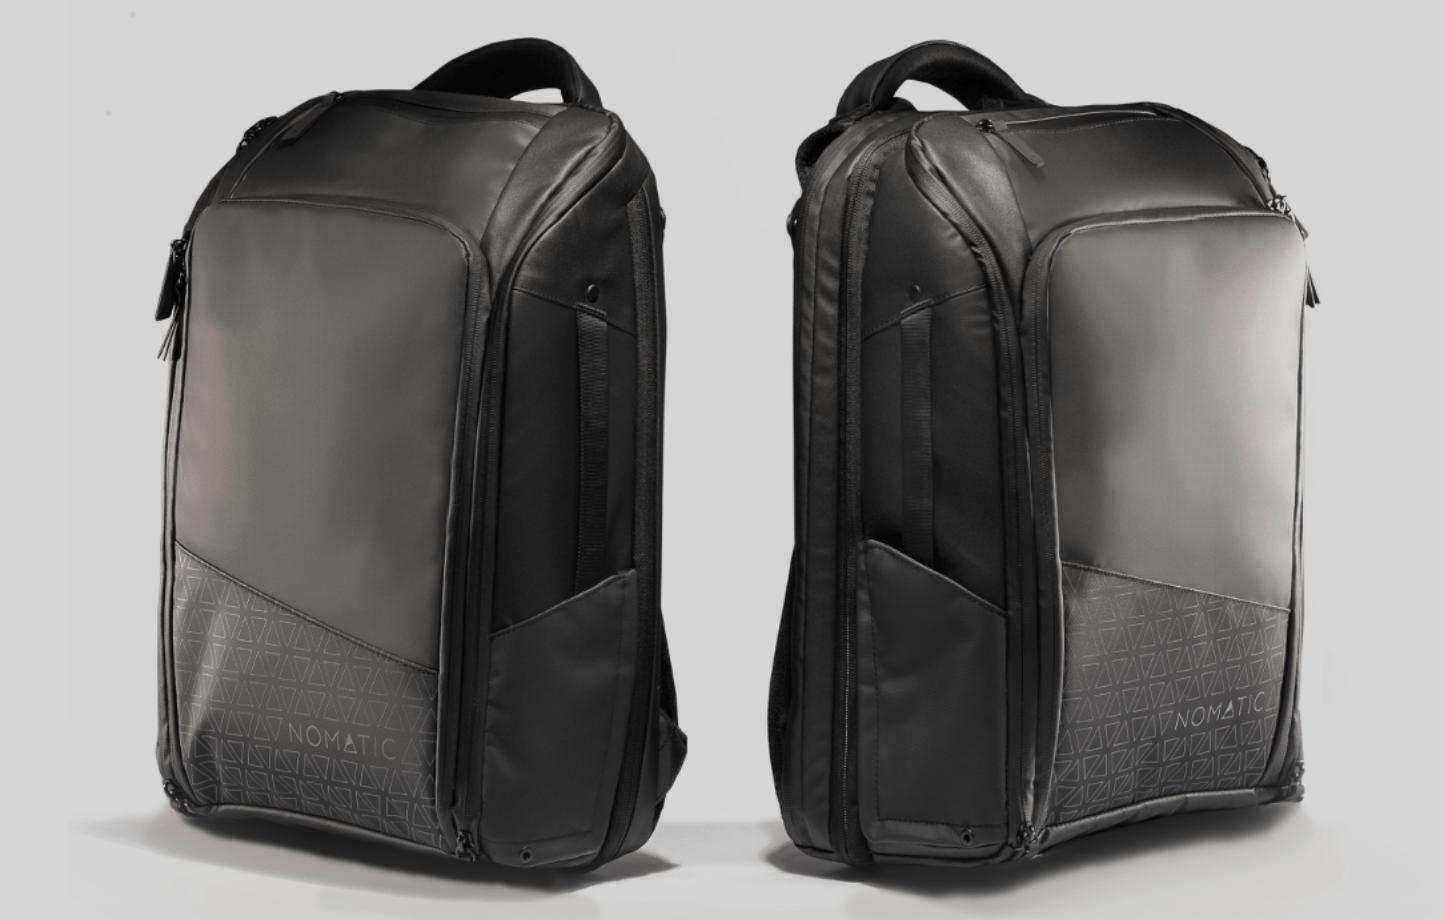 nomatic backpack and nomatic travel